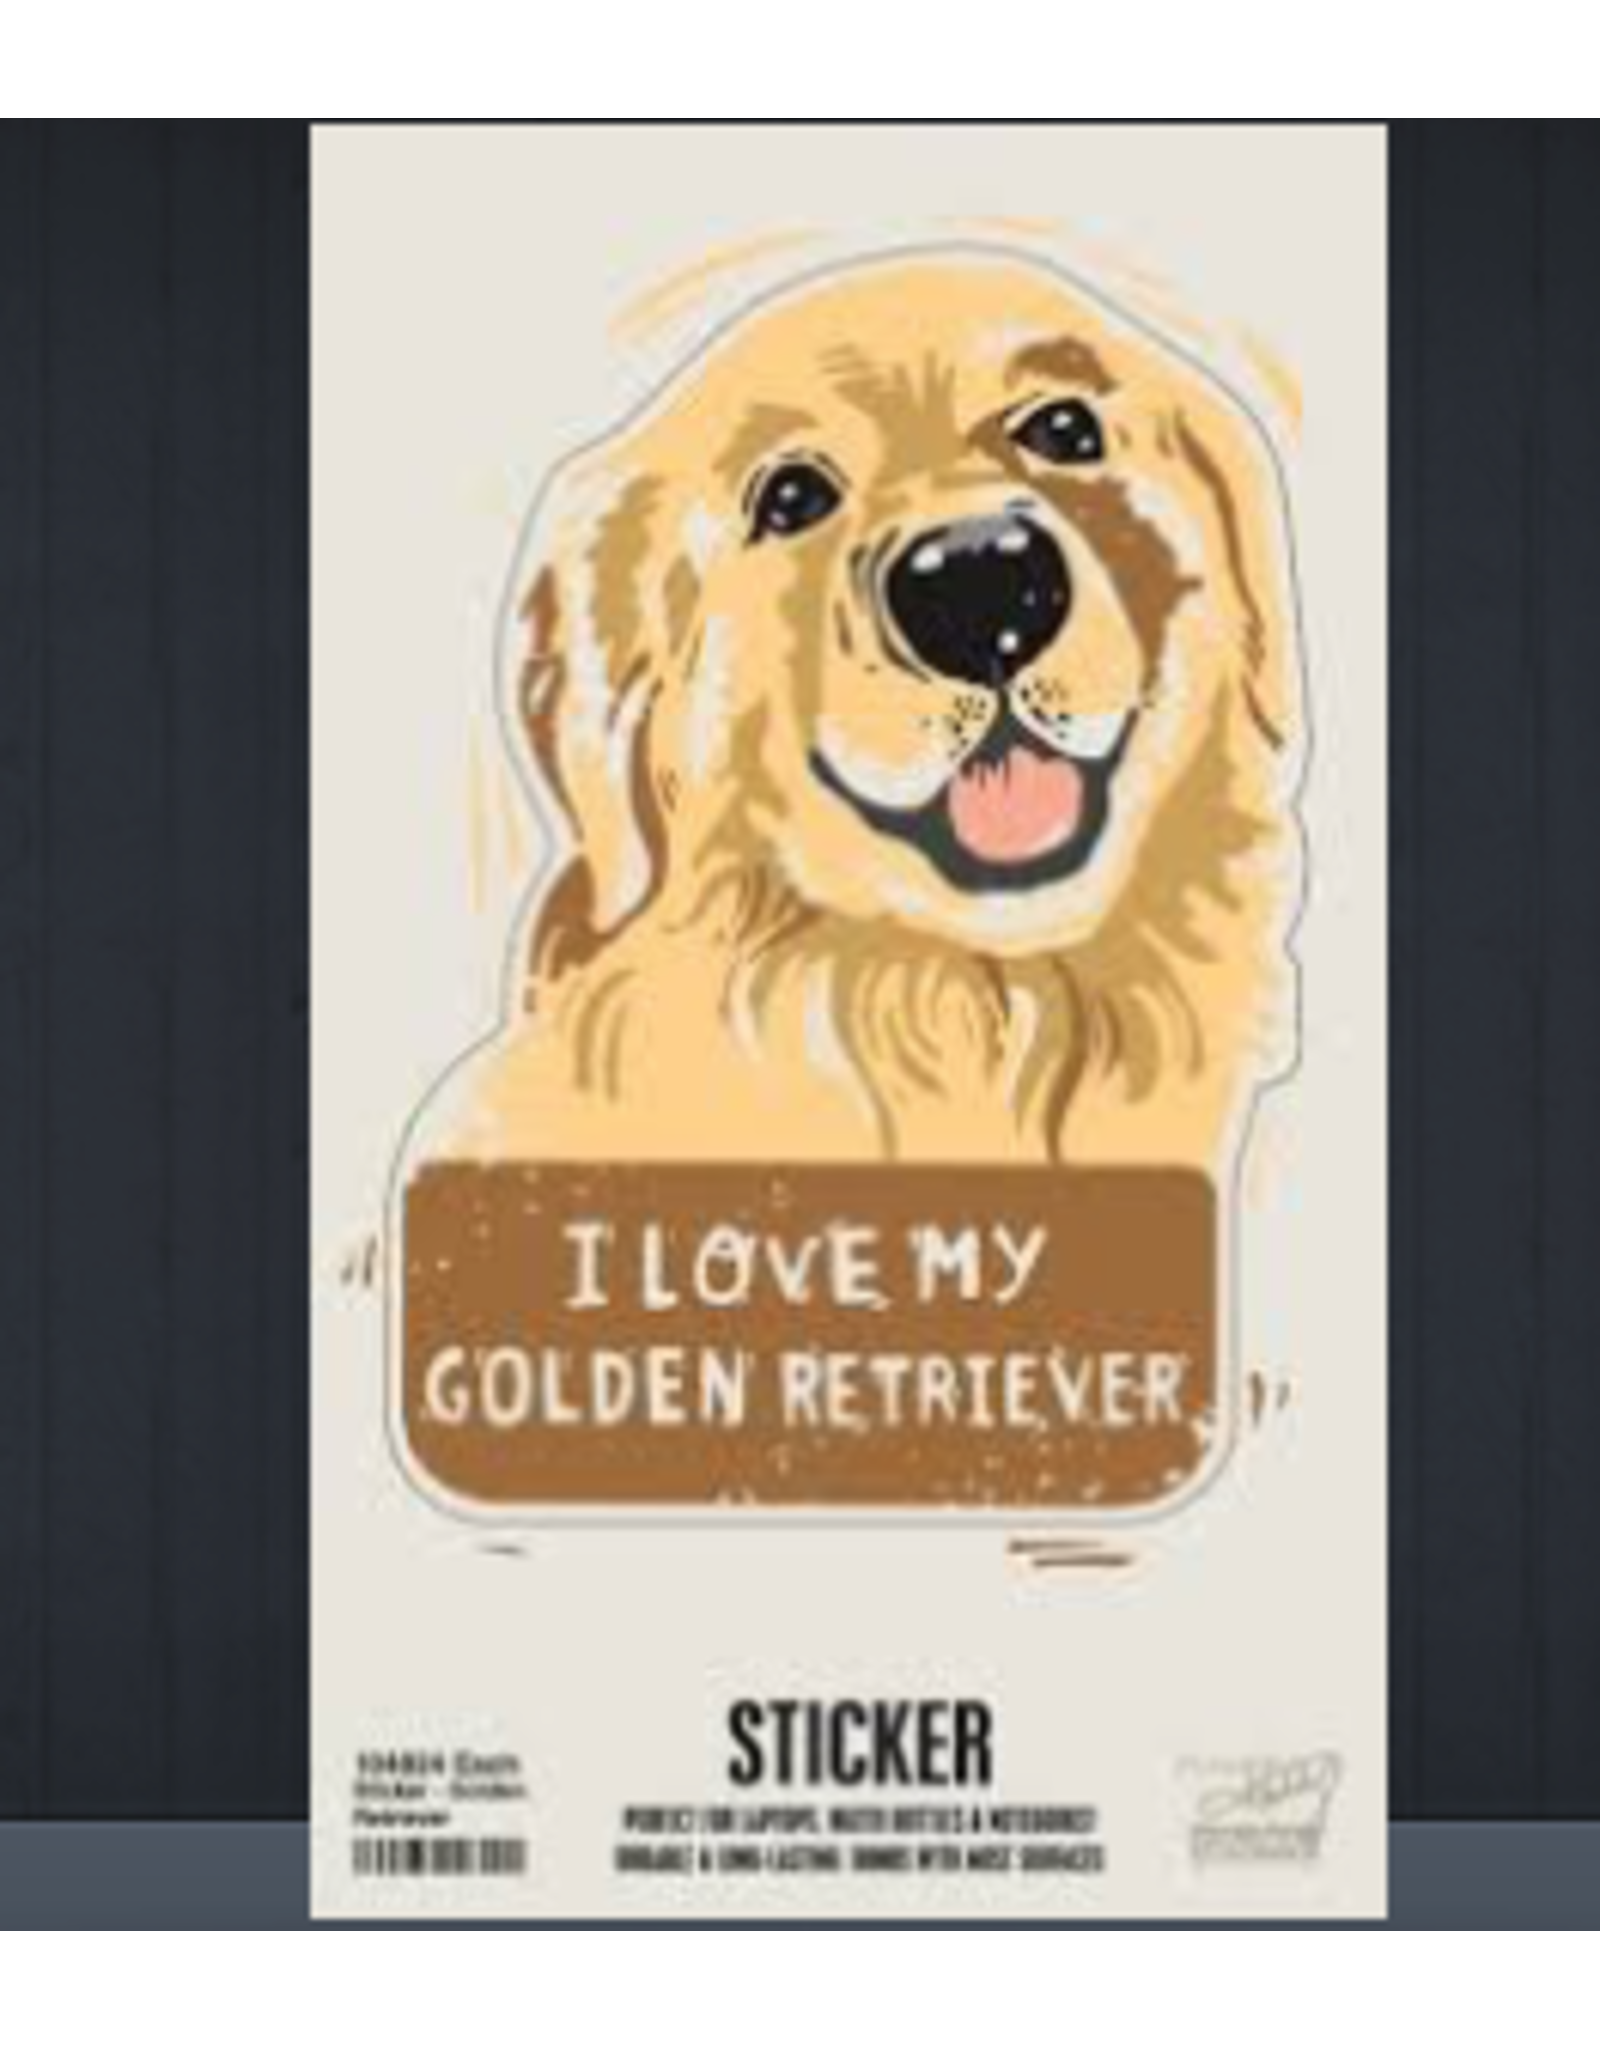 Sticker, I Love My Golden Retriever